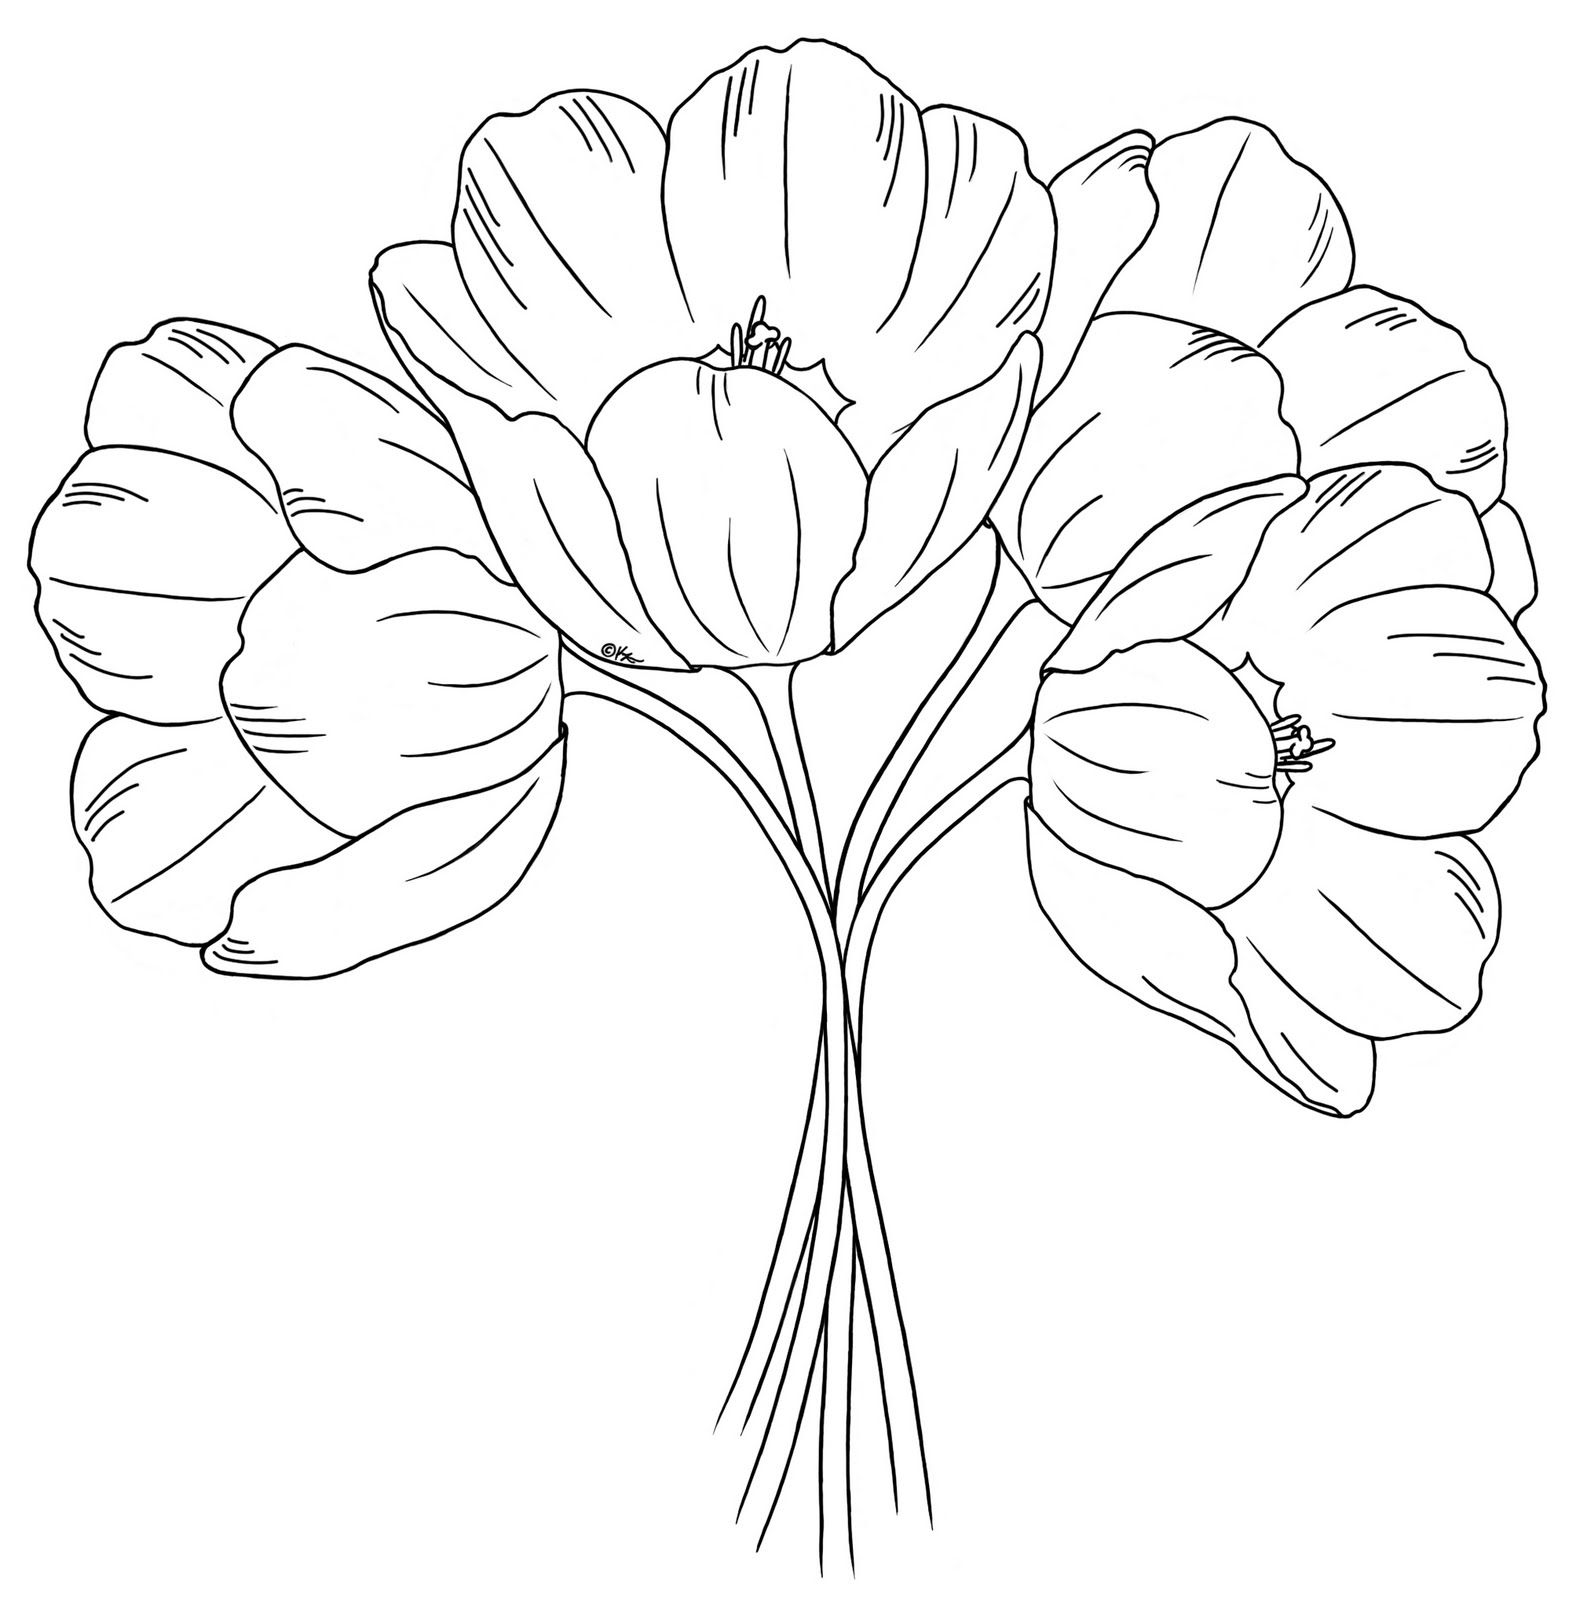 Line Drawing Of Tulip Flower : Open tulips drawing pixshark images galleries